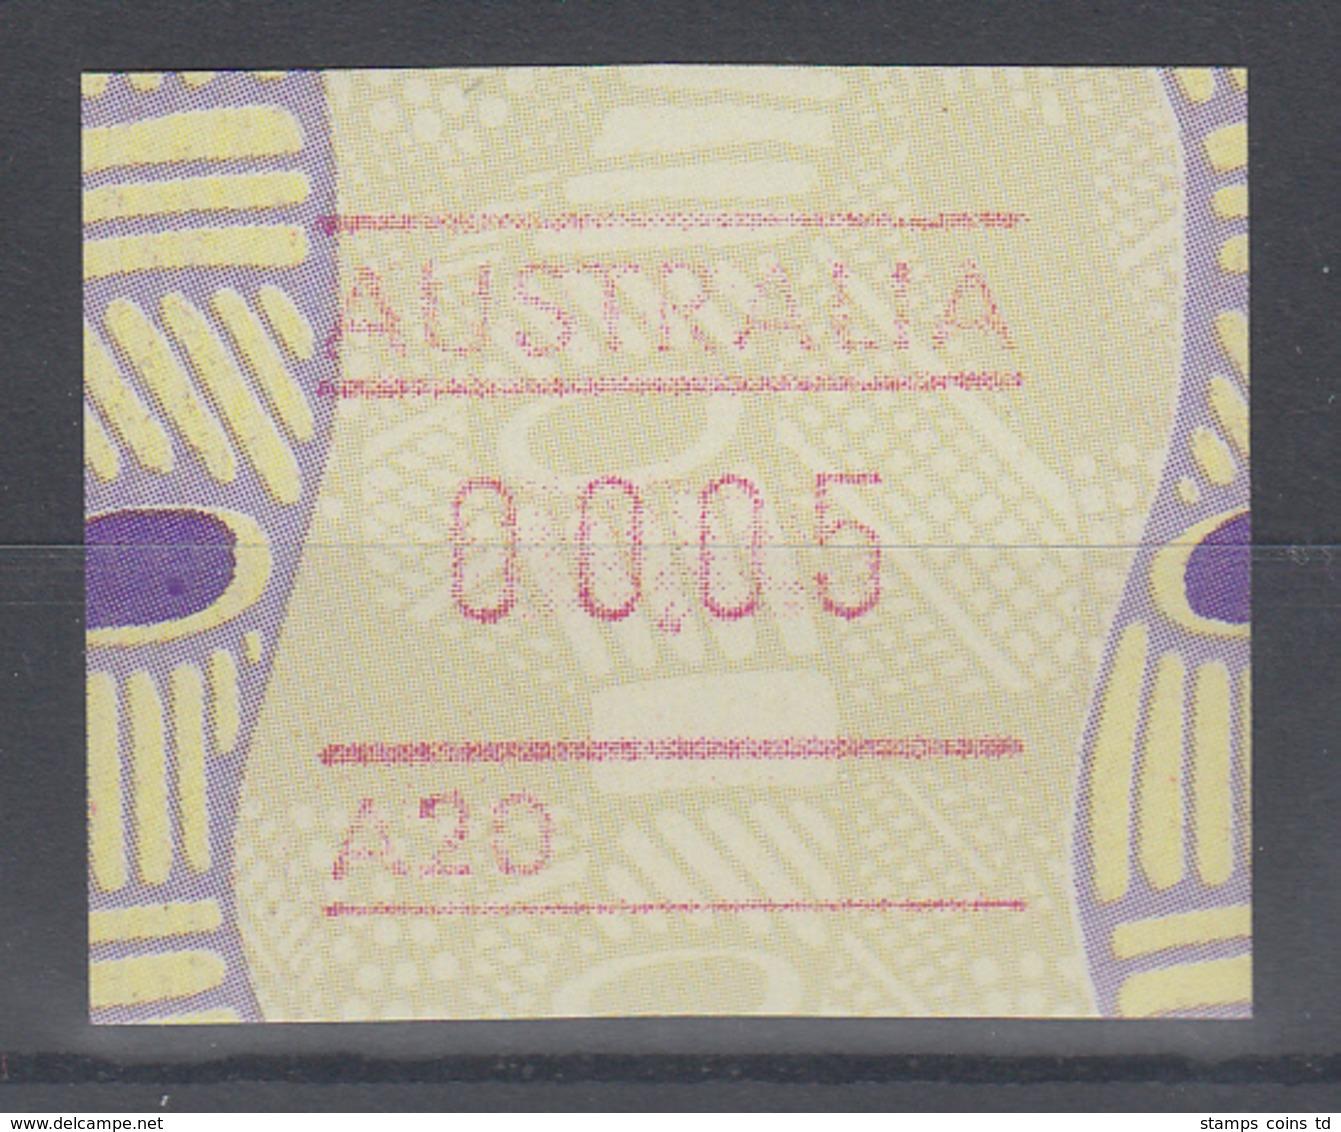 Australien Frama-ATM Aboriginal-Art Mit Automatennummer A20 ** - Vignette Di Affrancatura (ATM/Frama)